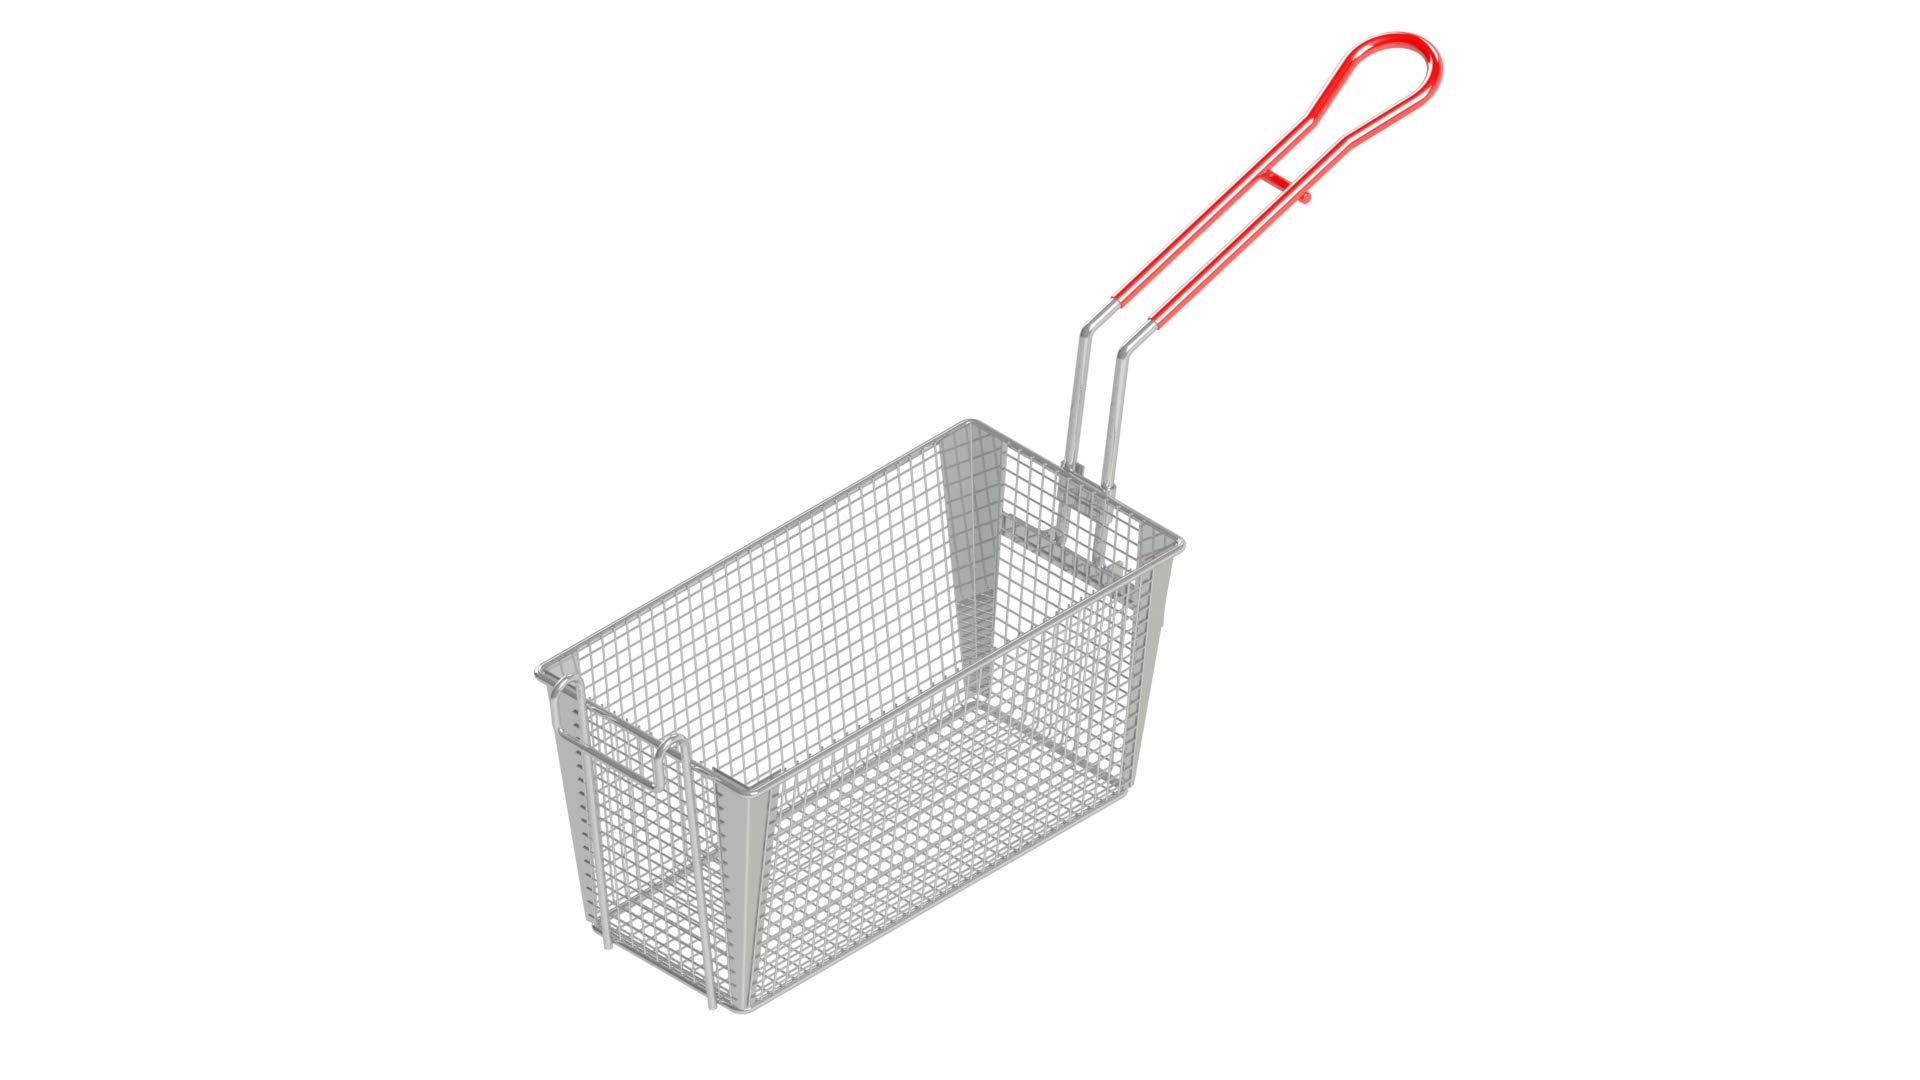 Case of 2 Pronto Fry Baskets